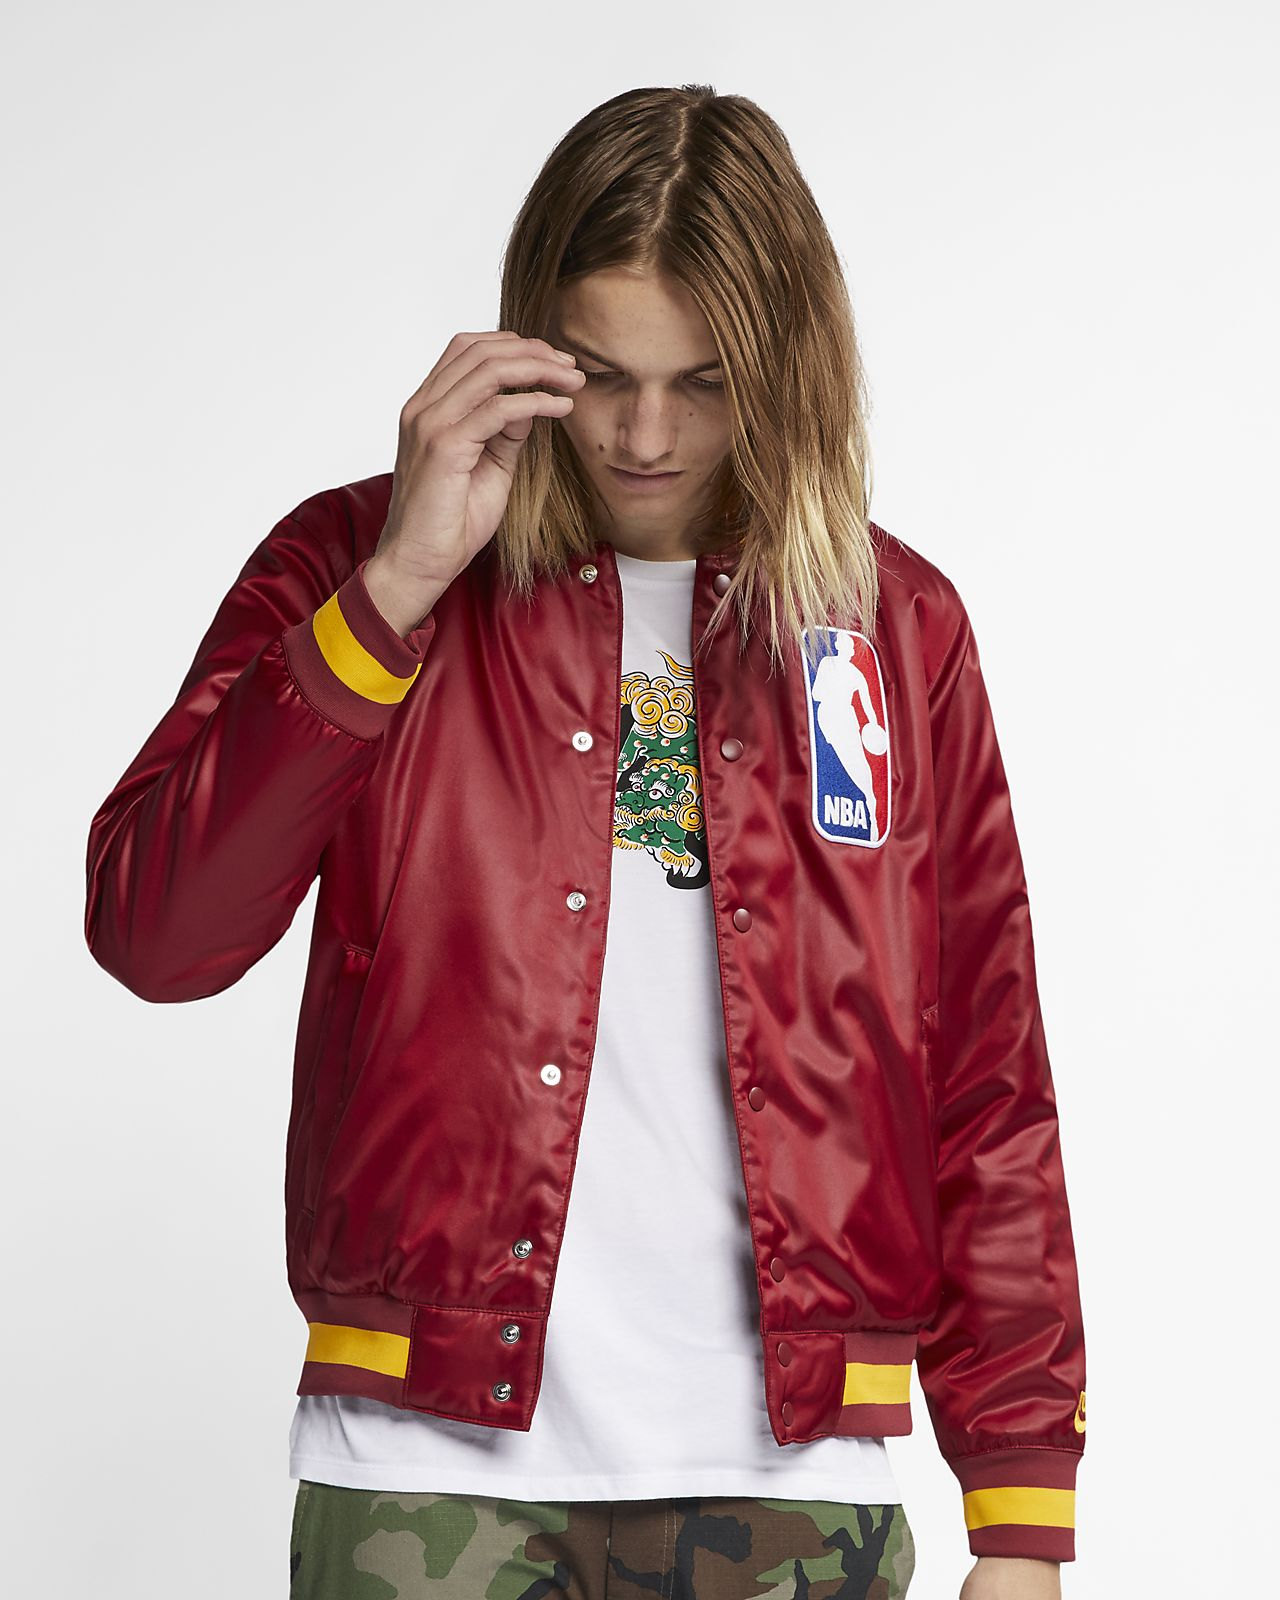 sale retailer 70cec 20f73 Men s Skate Bomber Jacket. Nike SB x NBA